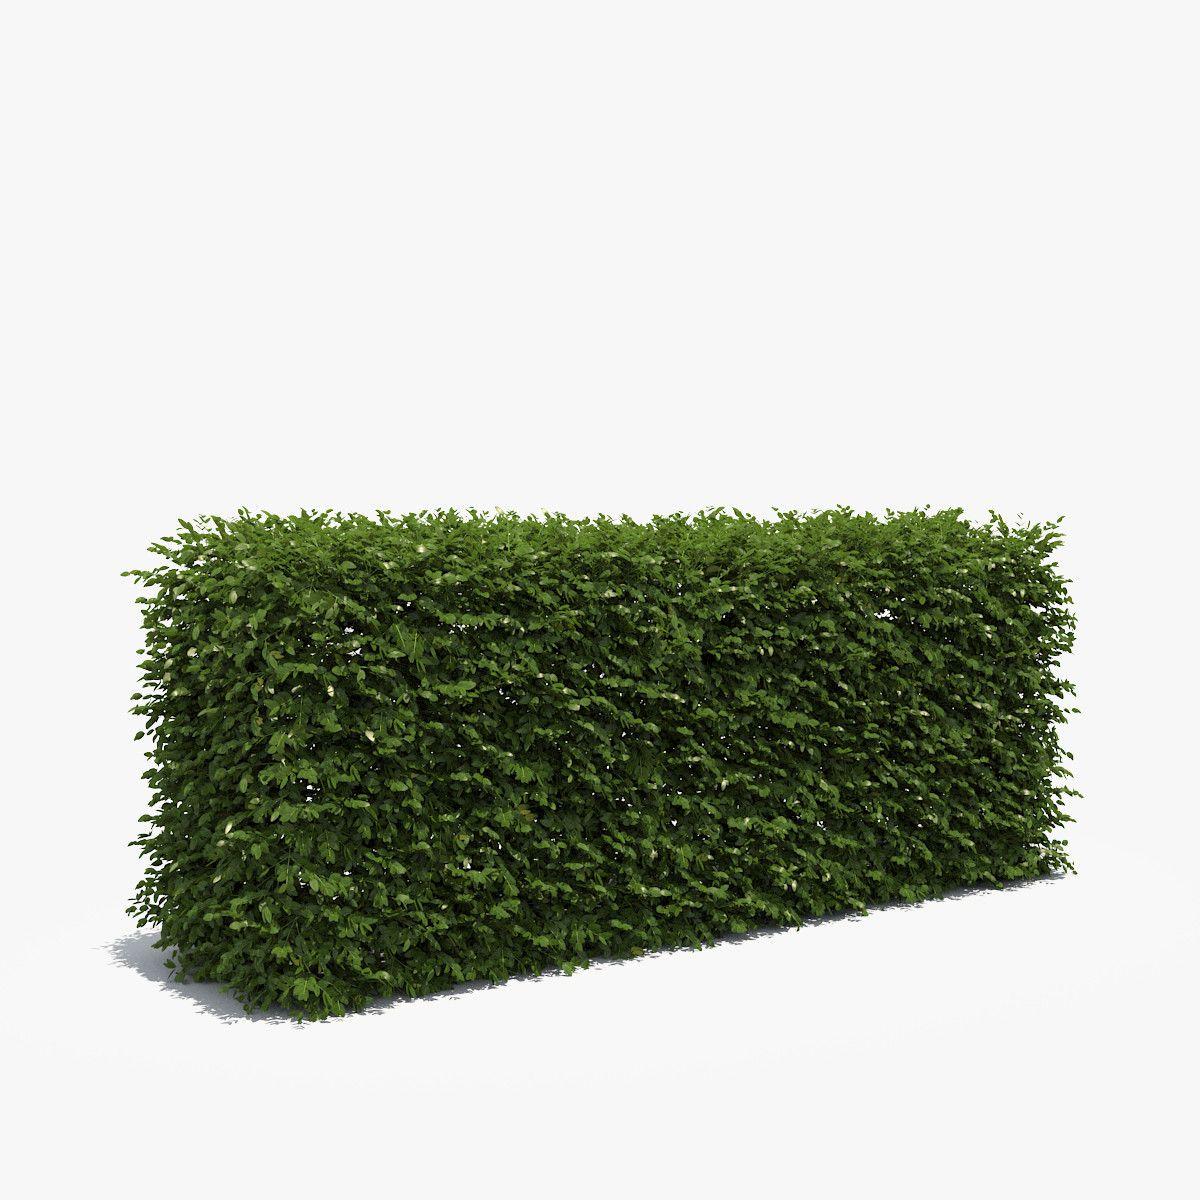 3d Model Cm Boxwood Hedge Box Hedges Trees To Plant Landscape Design